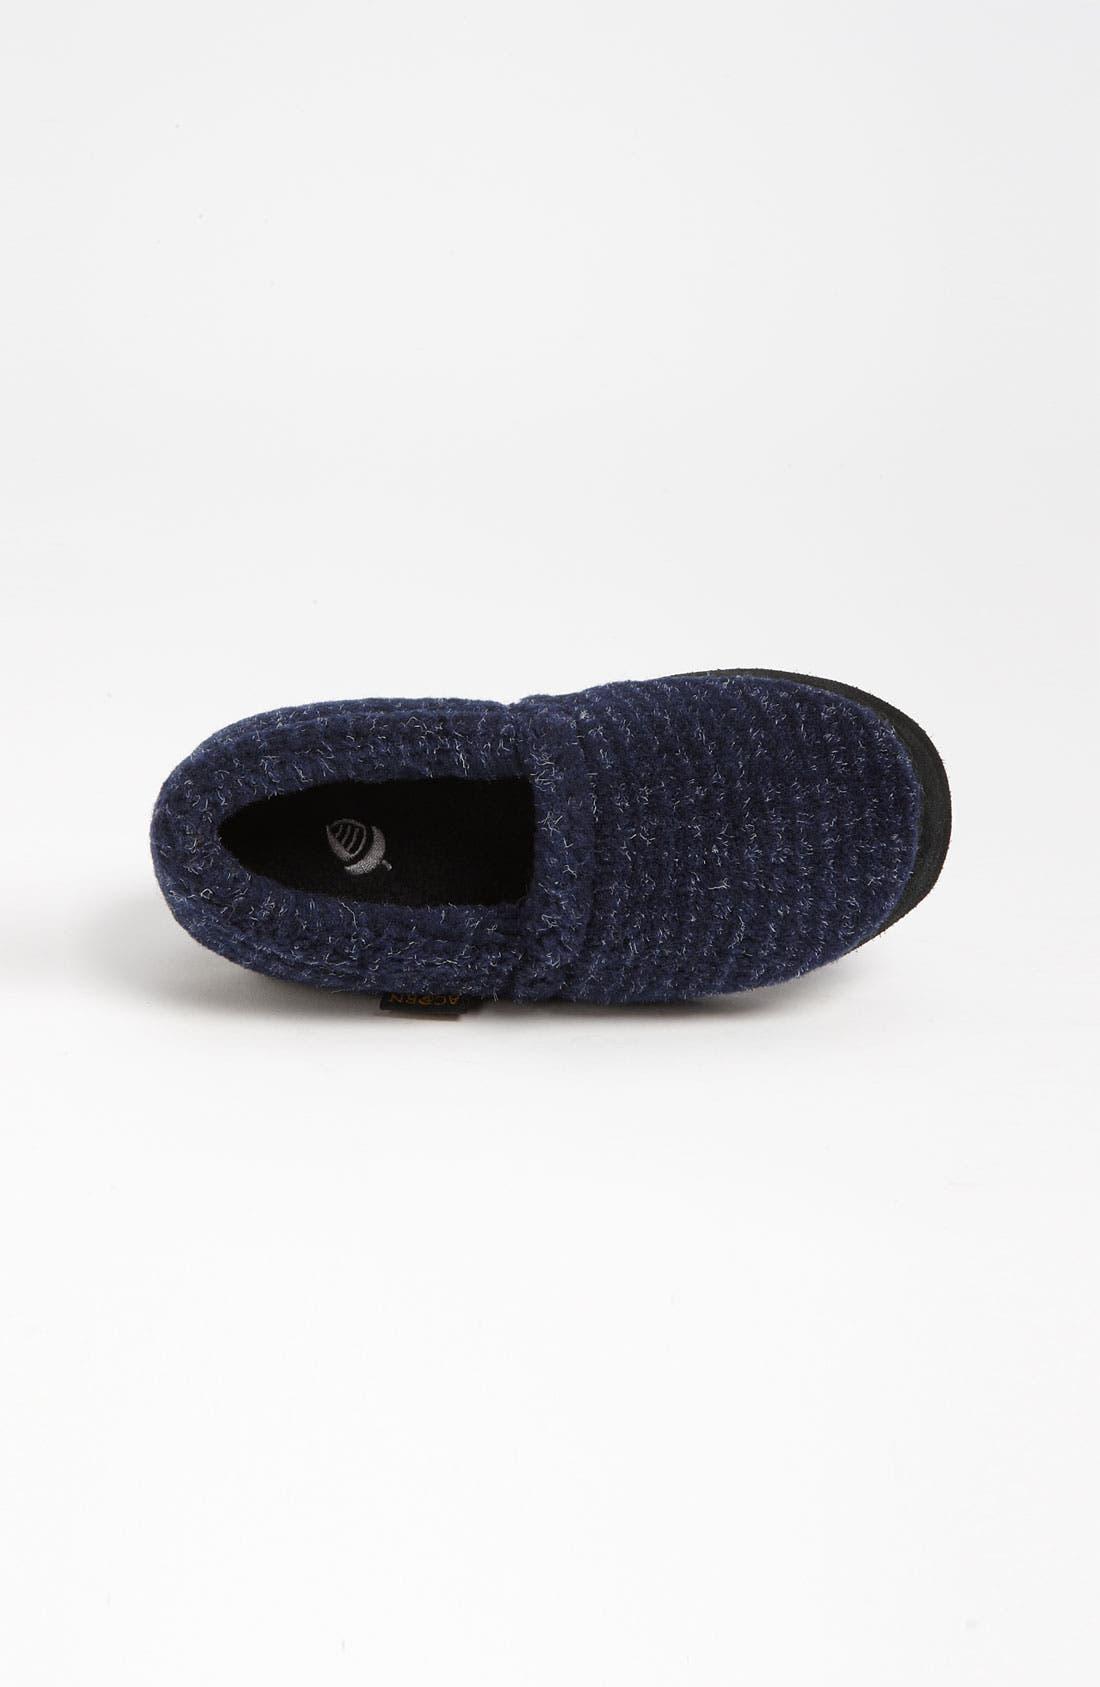 Alternate Image 3  - Acorn 'Textured Moc' Slipper (Toddler, Little Kid & Big Kid)